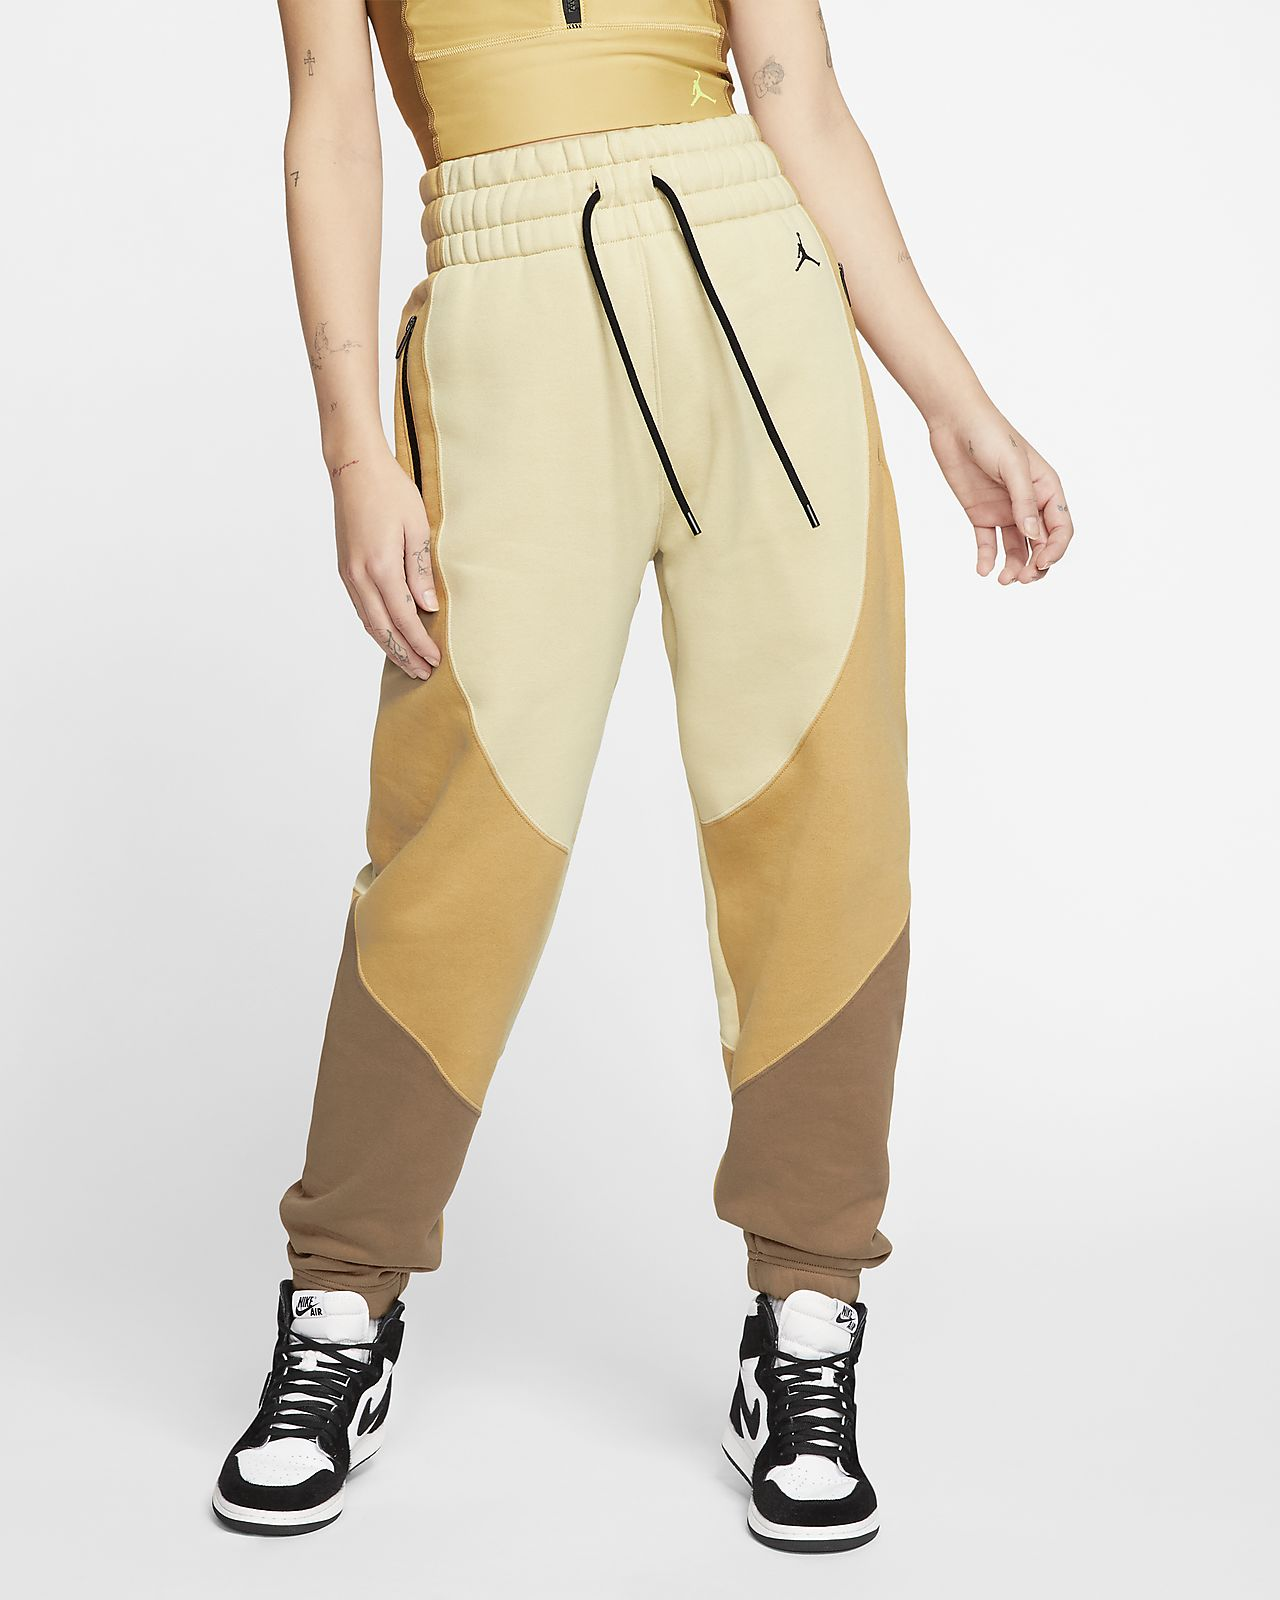 Pantalon en tissu Fleece Jordan pour Femme